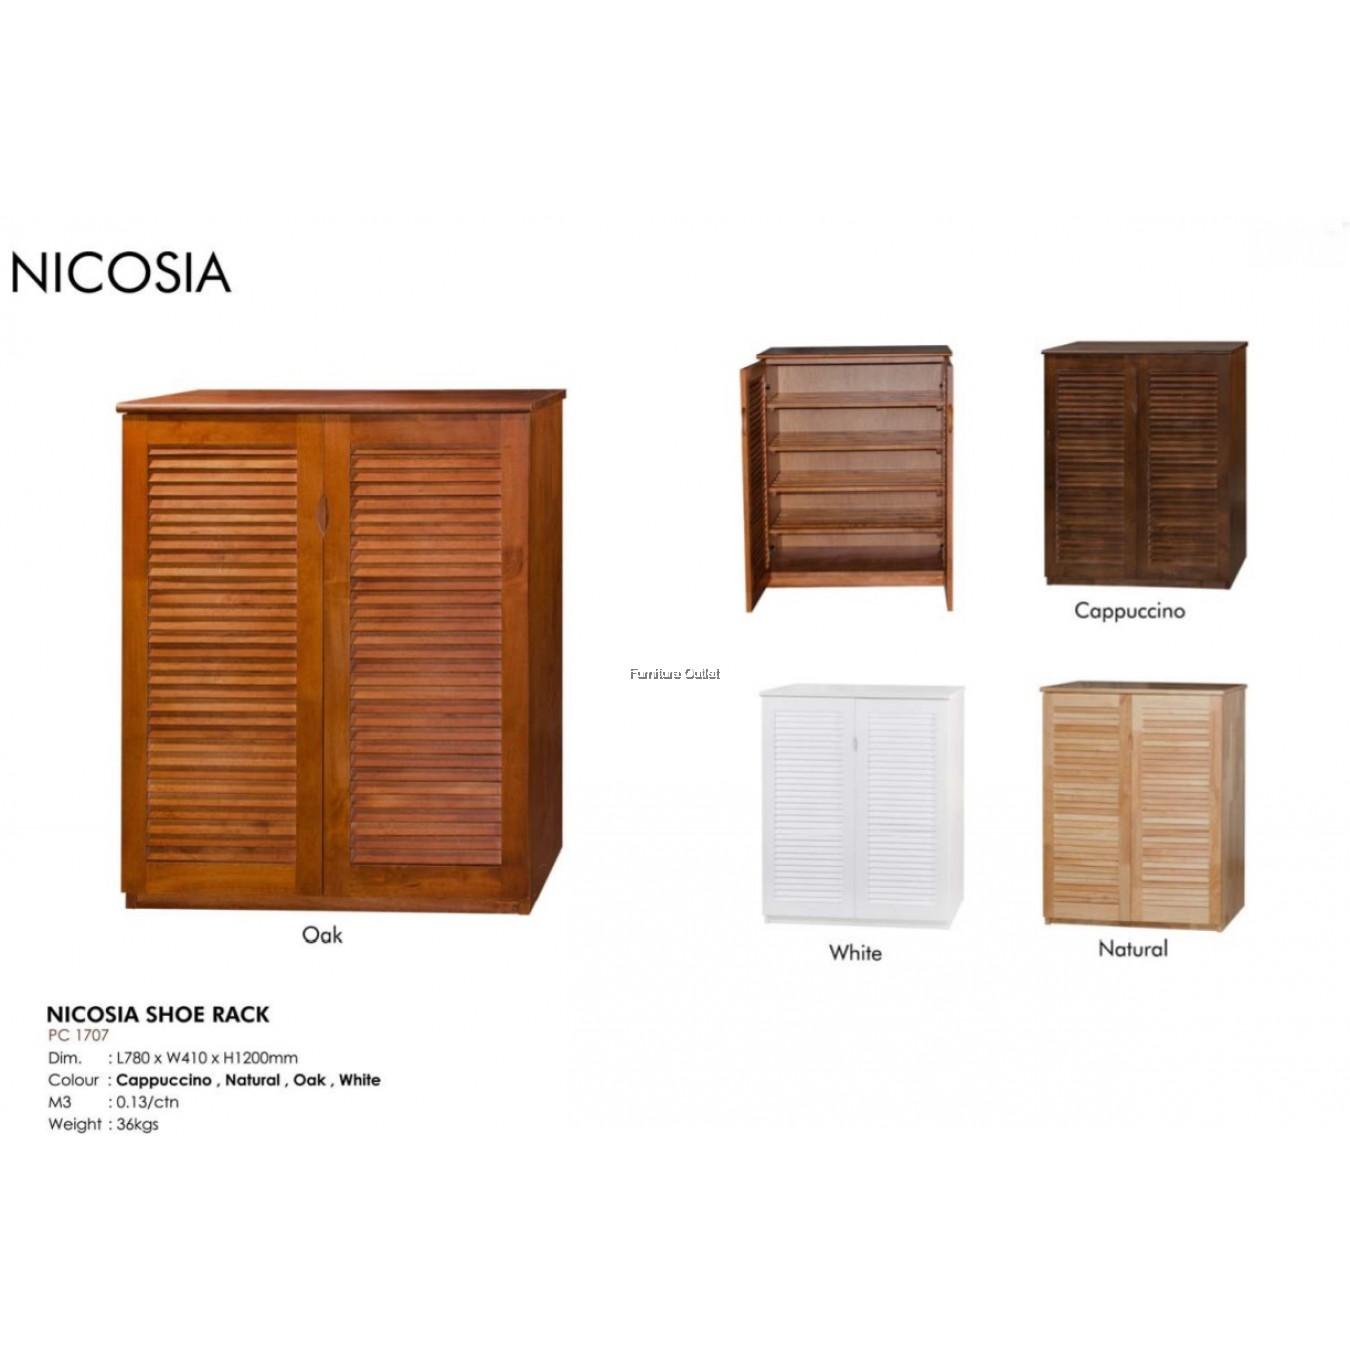 NICOSIA SHOE RACK - CAPPUCCINO / WHITE / NATURAL / OAK